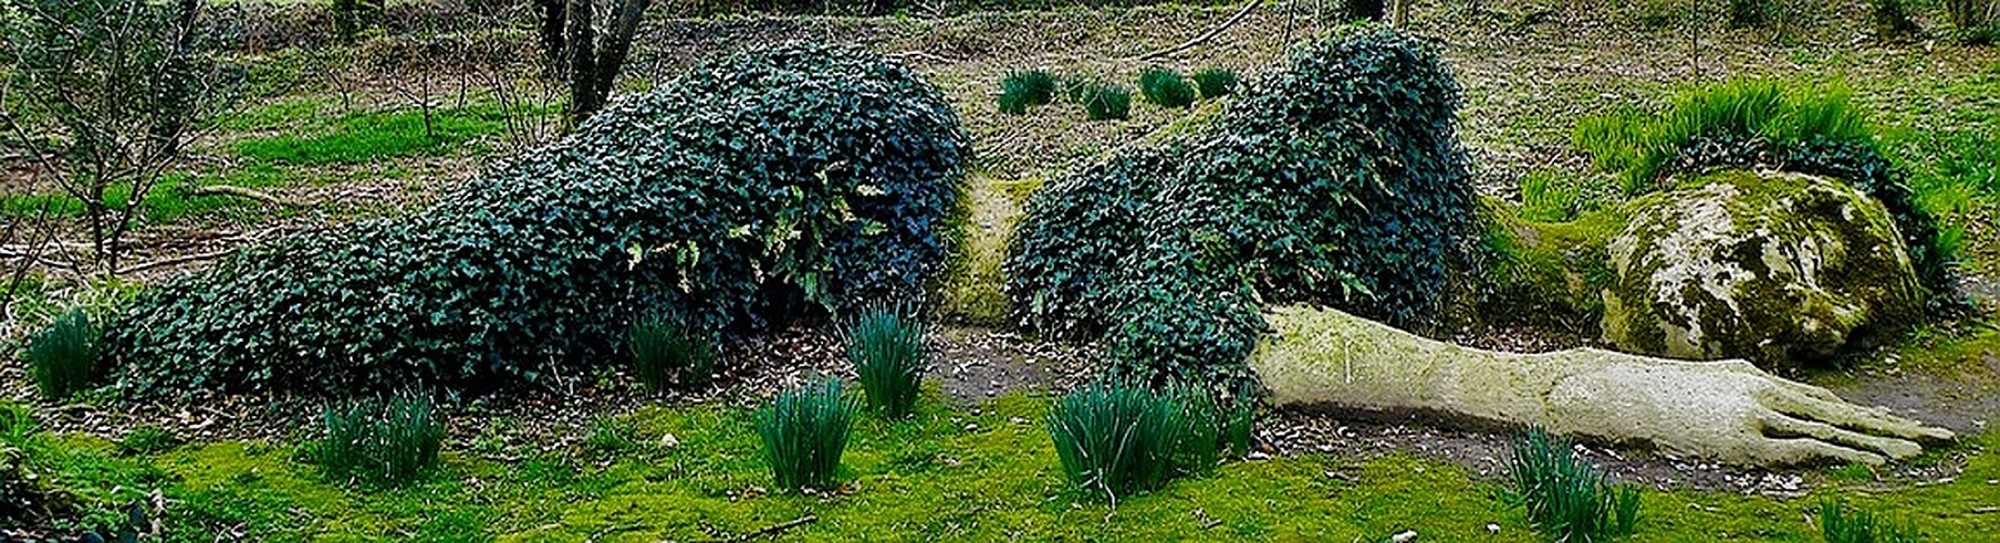 Lost Gardens of Heligan sleeping giant